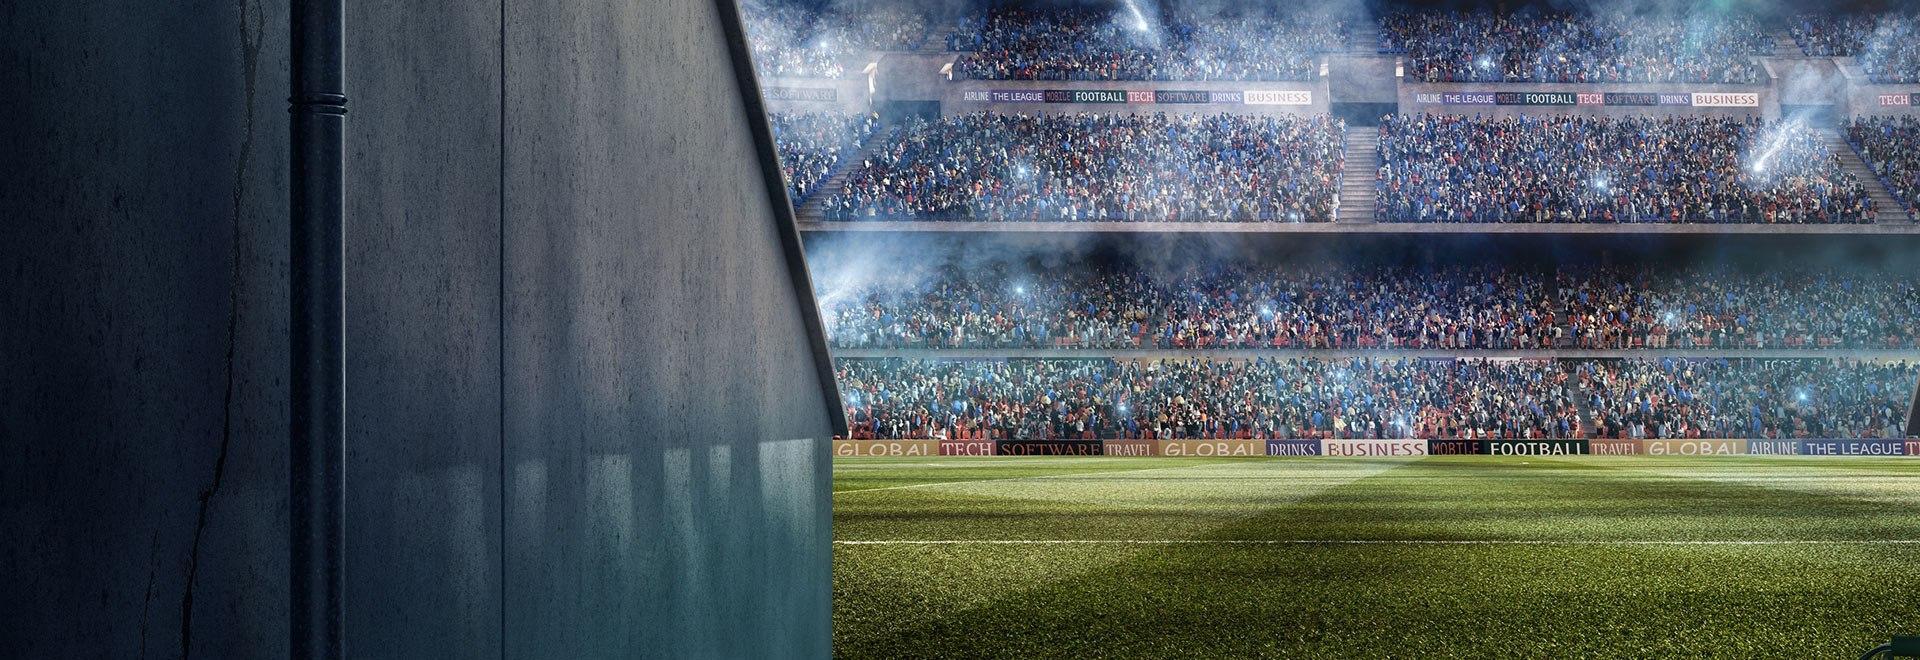 Catania - Foggia. Playoff 1° turno